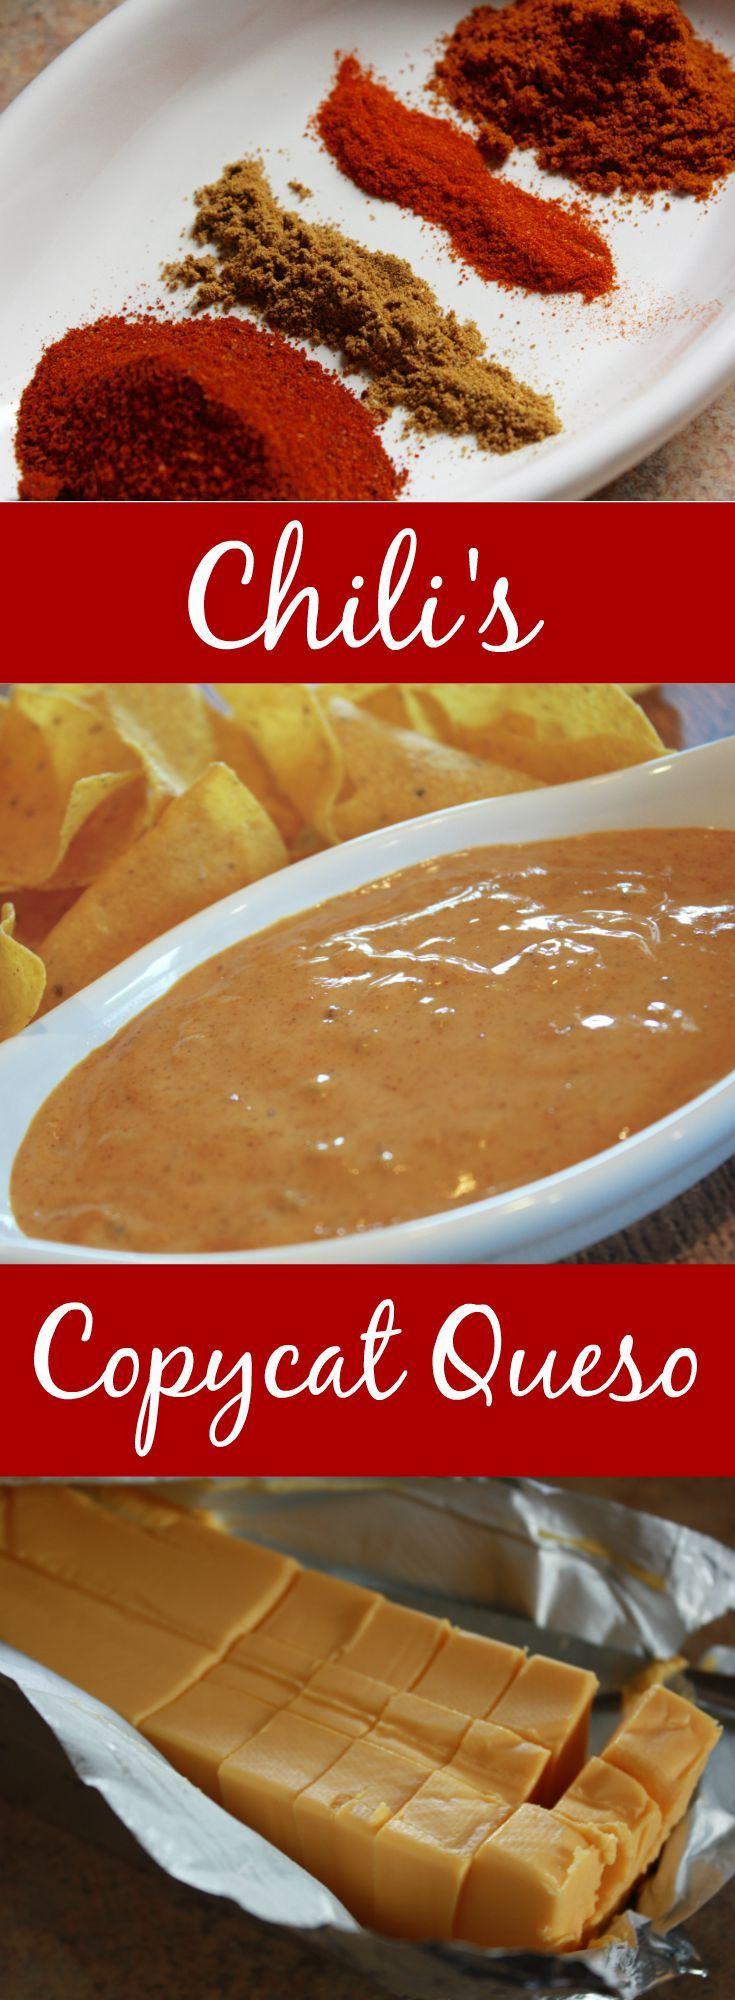 Copycat Chili's Restaurant Menu Item: Chili's Skillet Queso ...